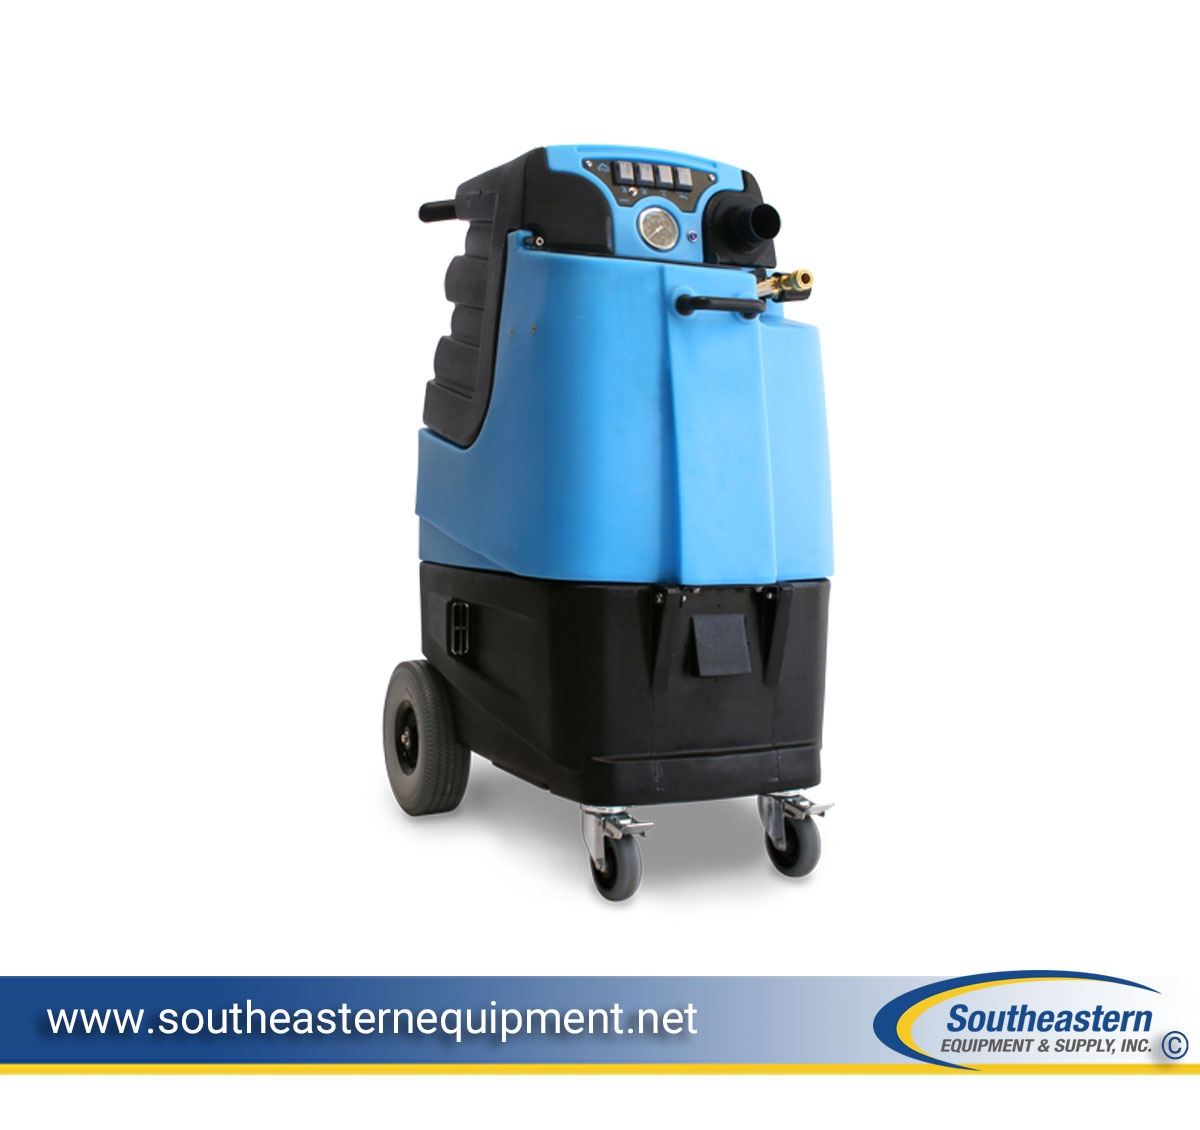 New Mytee LTD5-LX Speedster Carpet Extractor